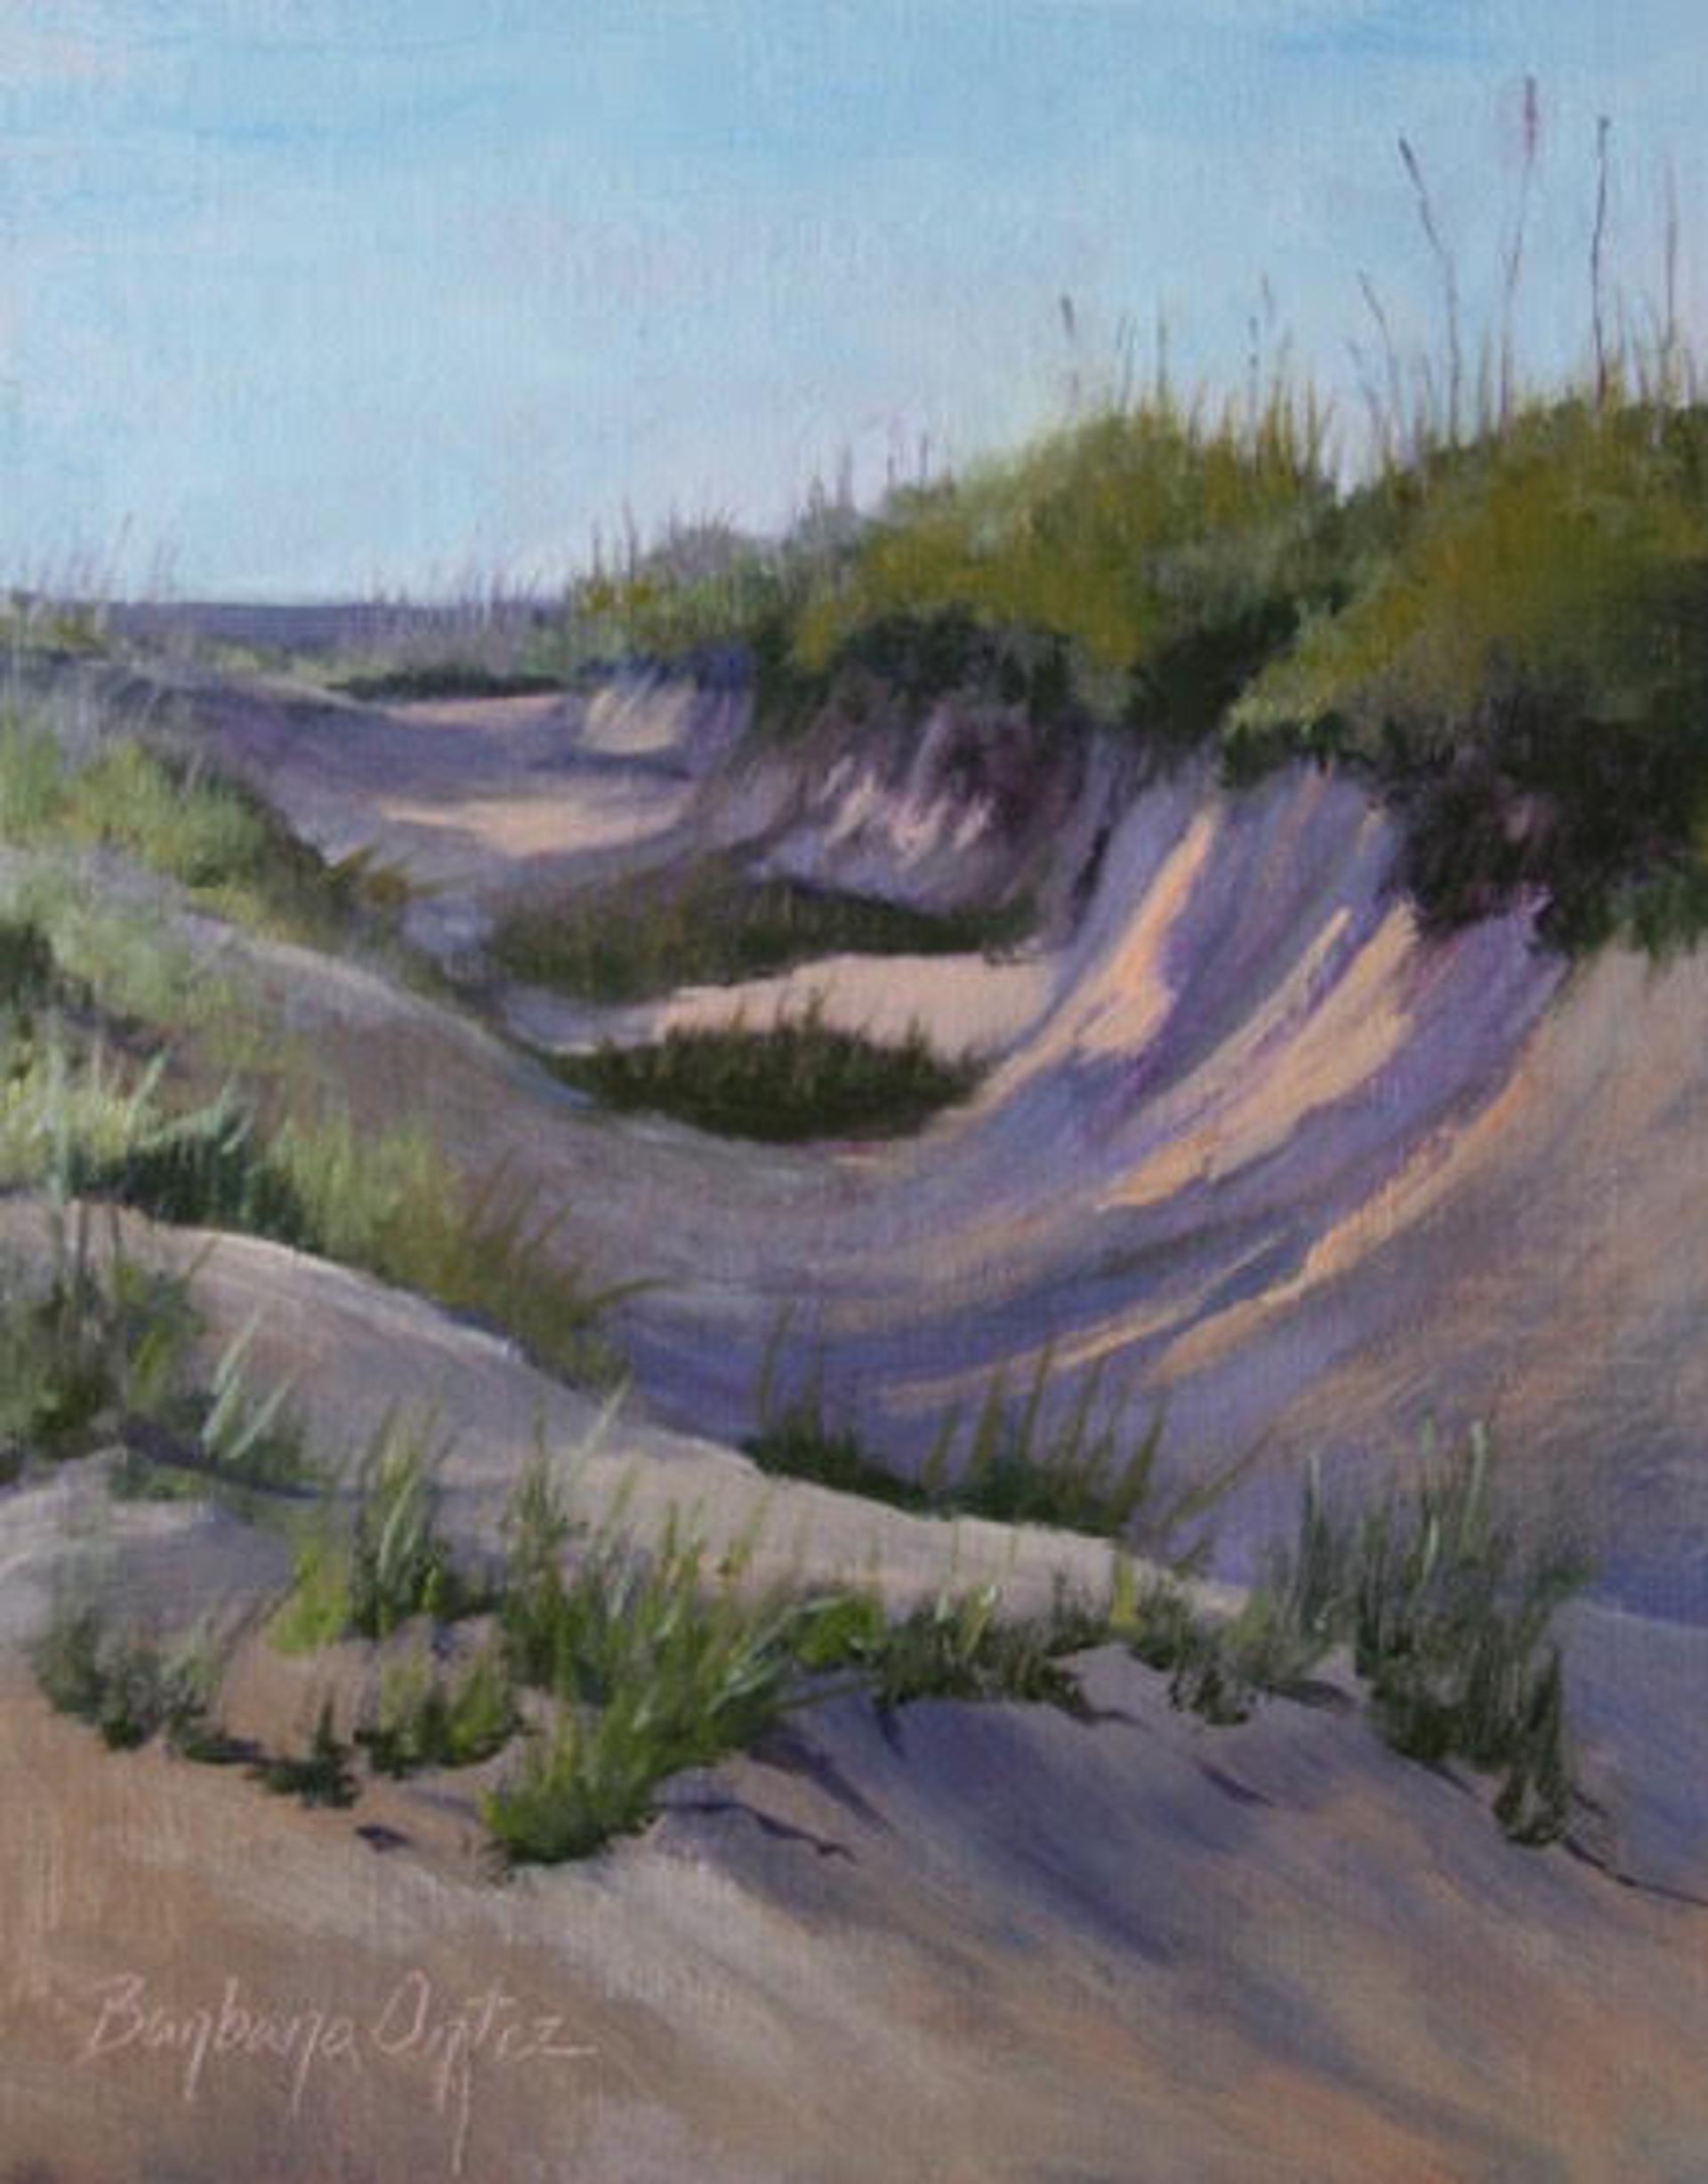 Essential Dunes by Barbara Ortiz